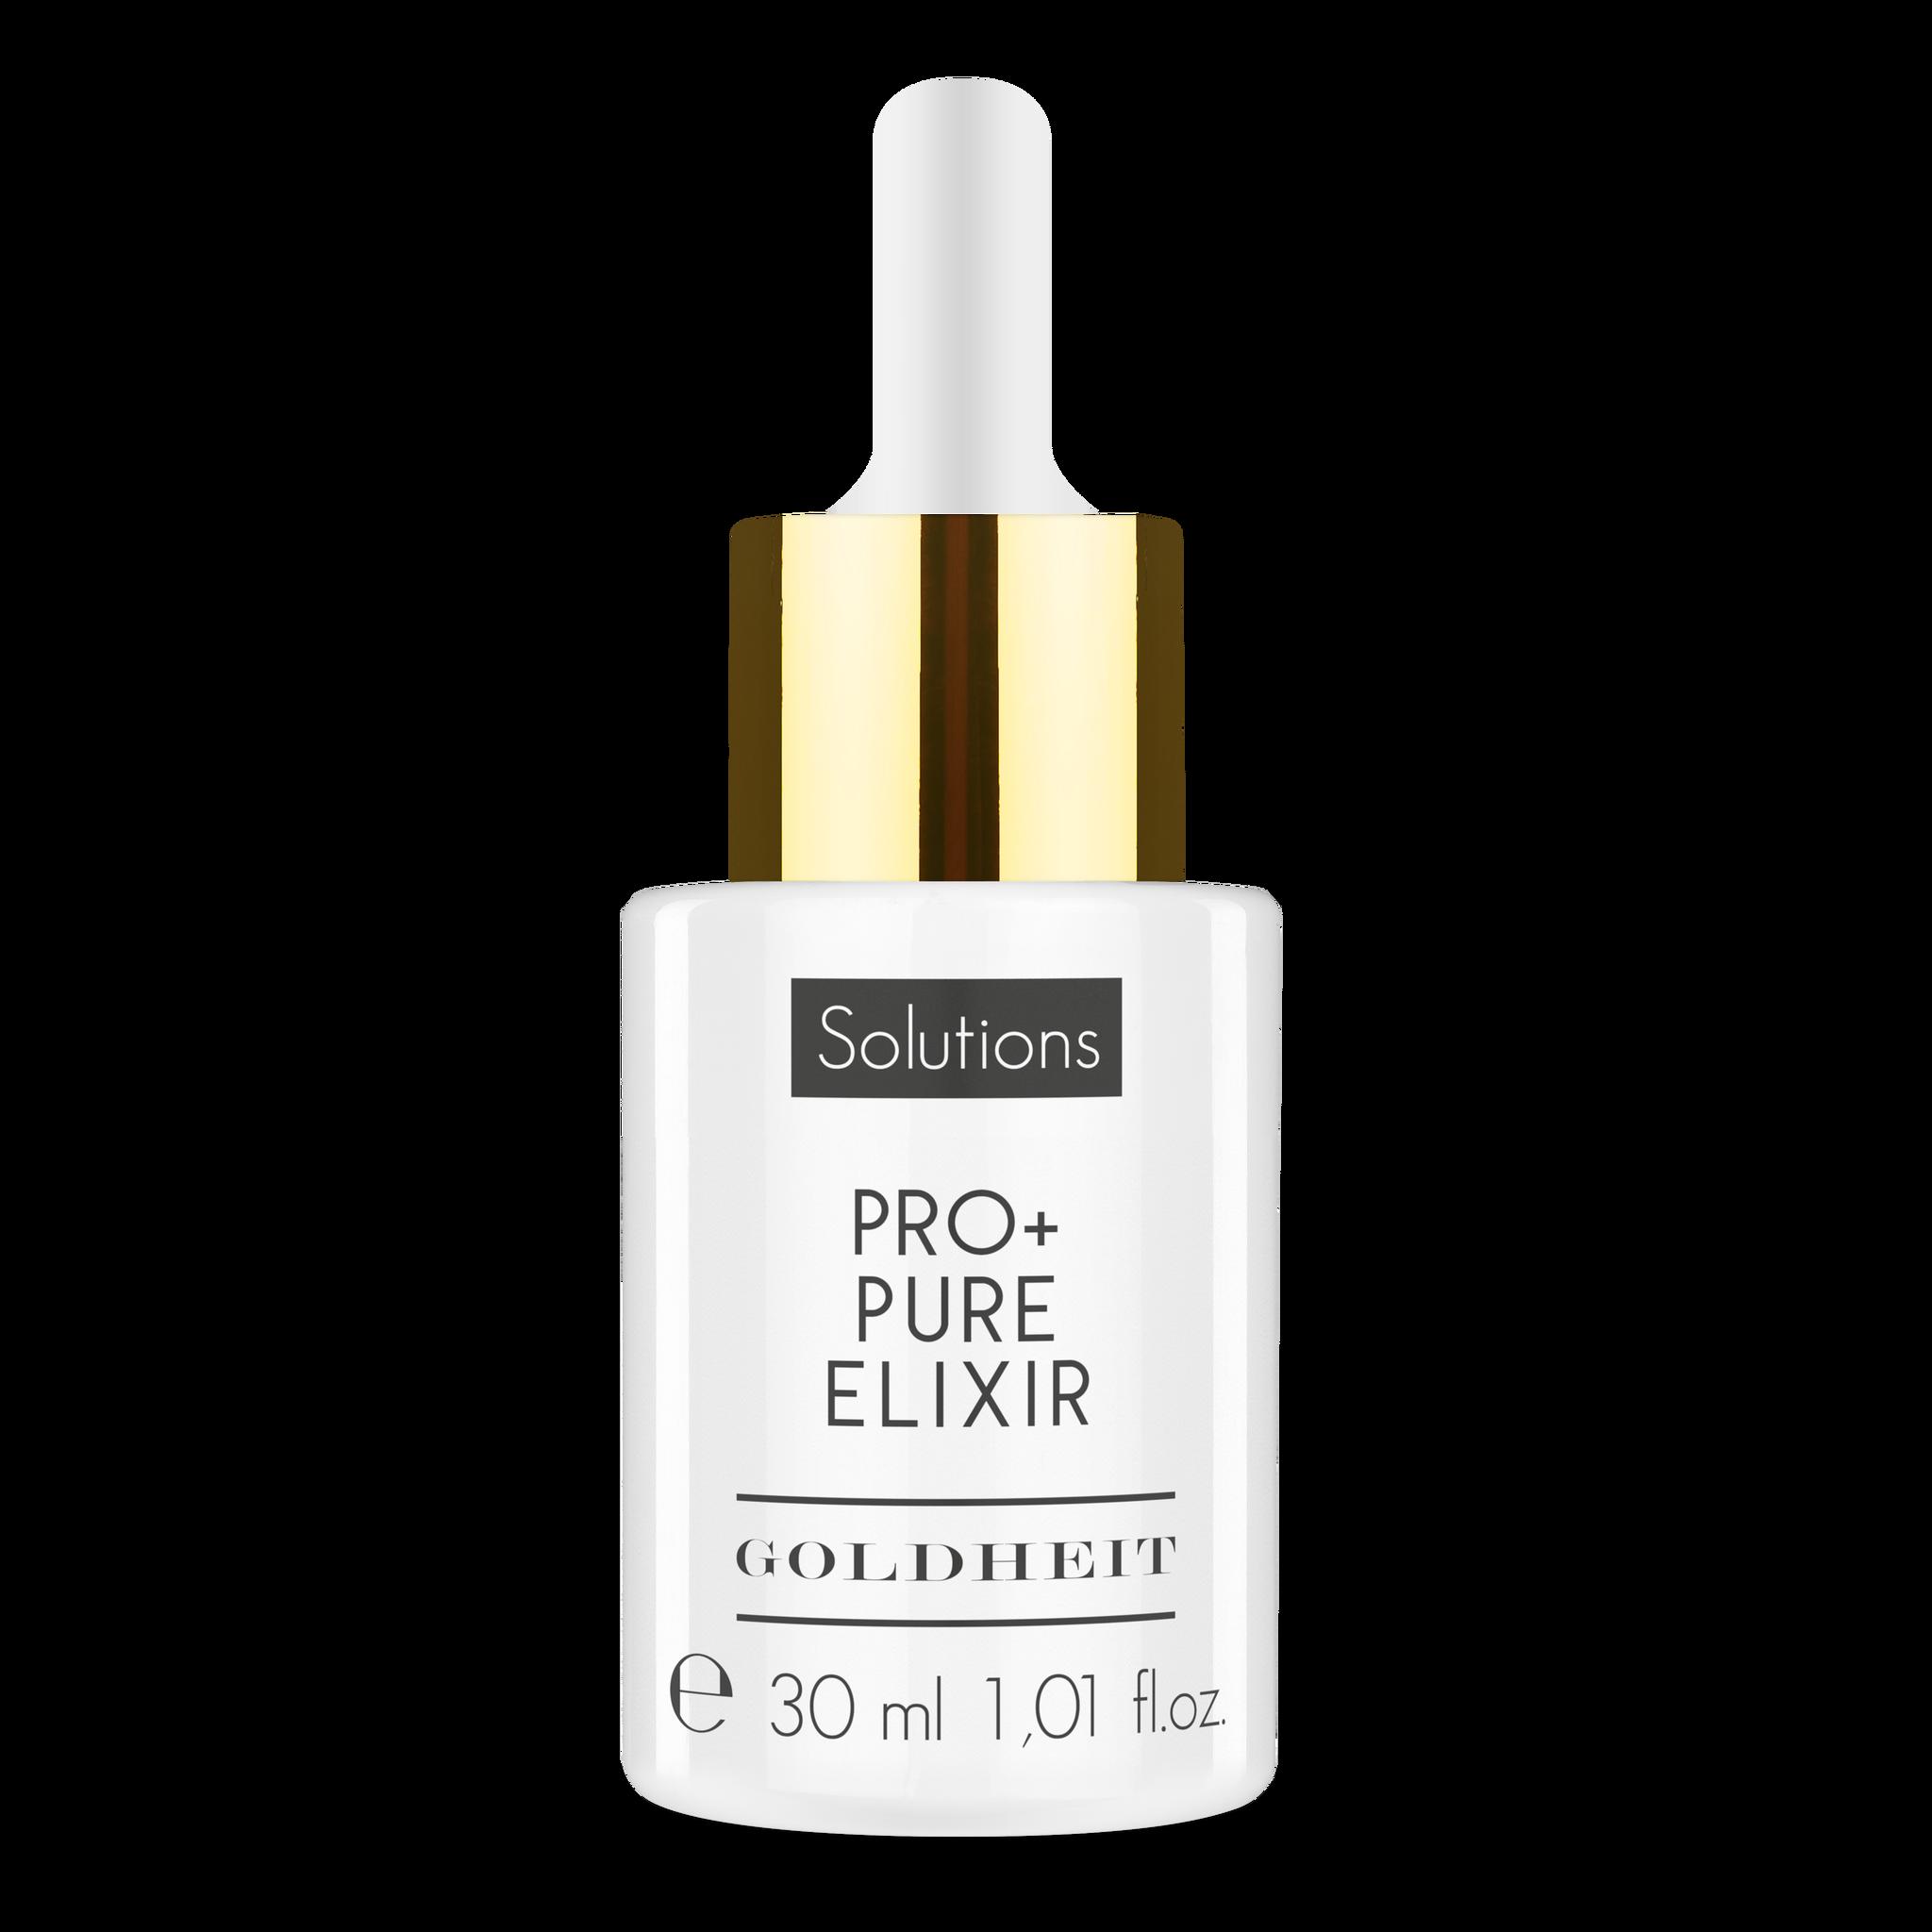 Pro+ Pure Elixir 30 ml